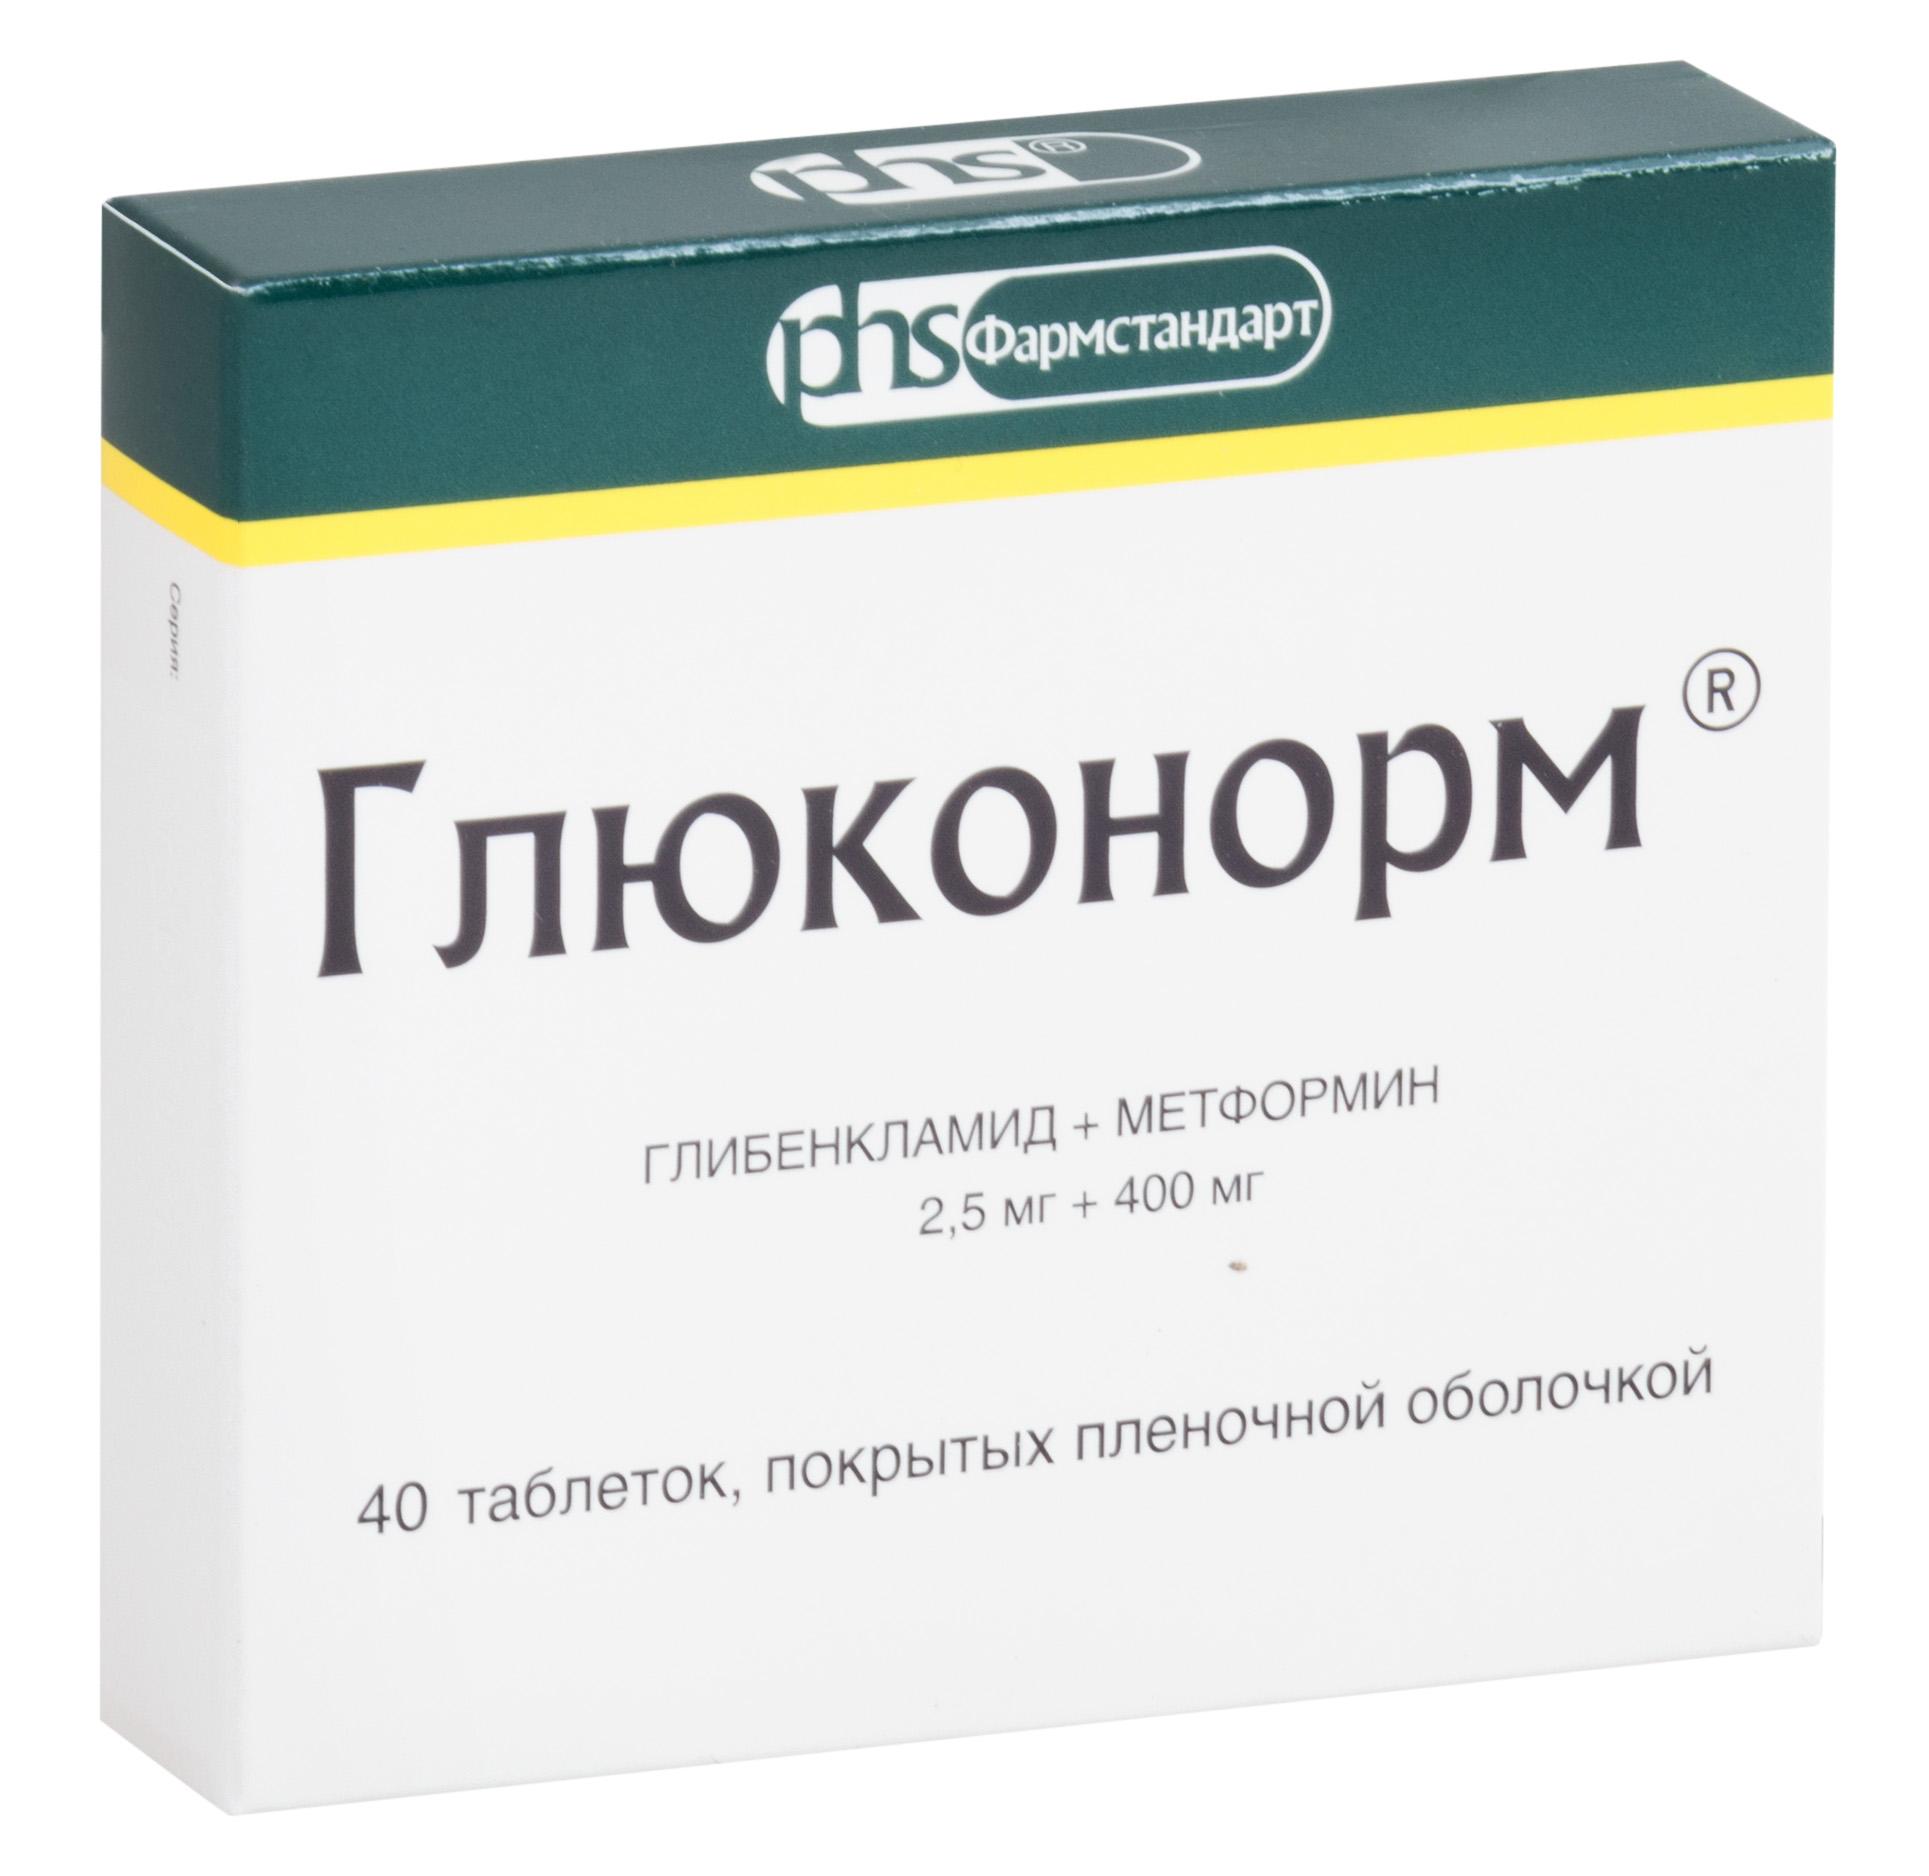 Глюконорм таб. п.п.о. 2,5мг+400мг n40